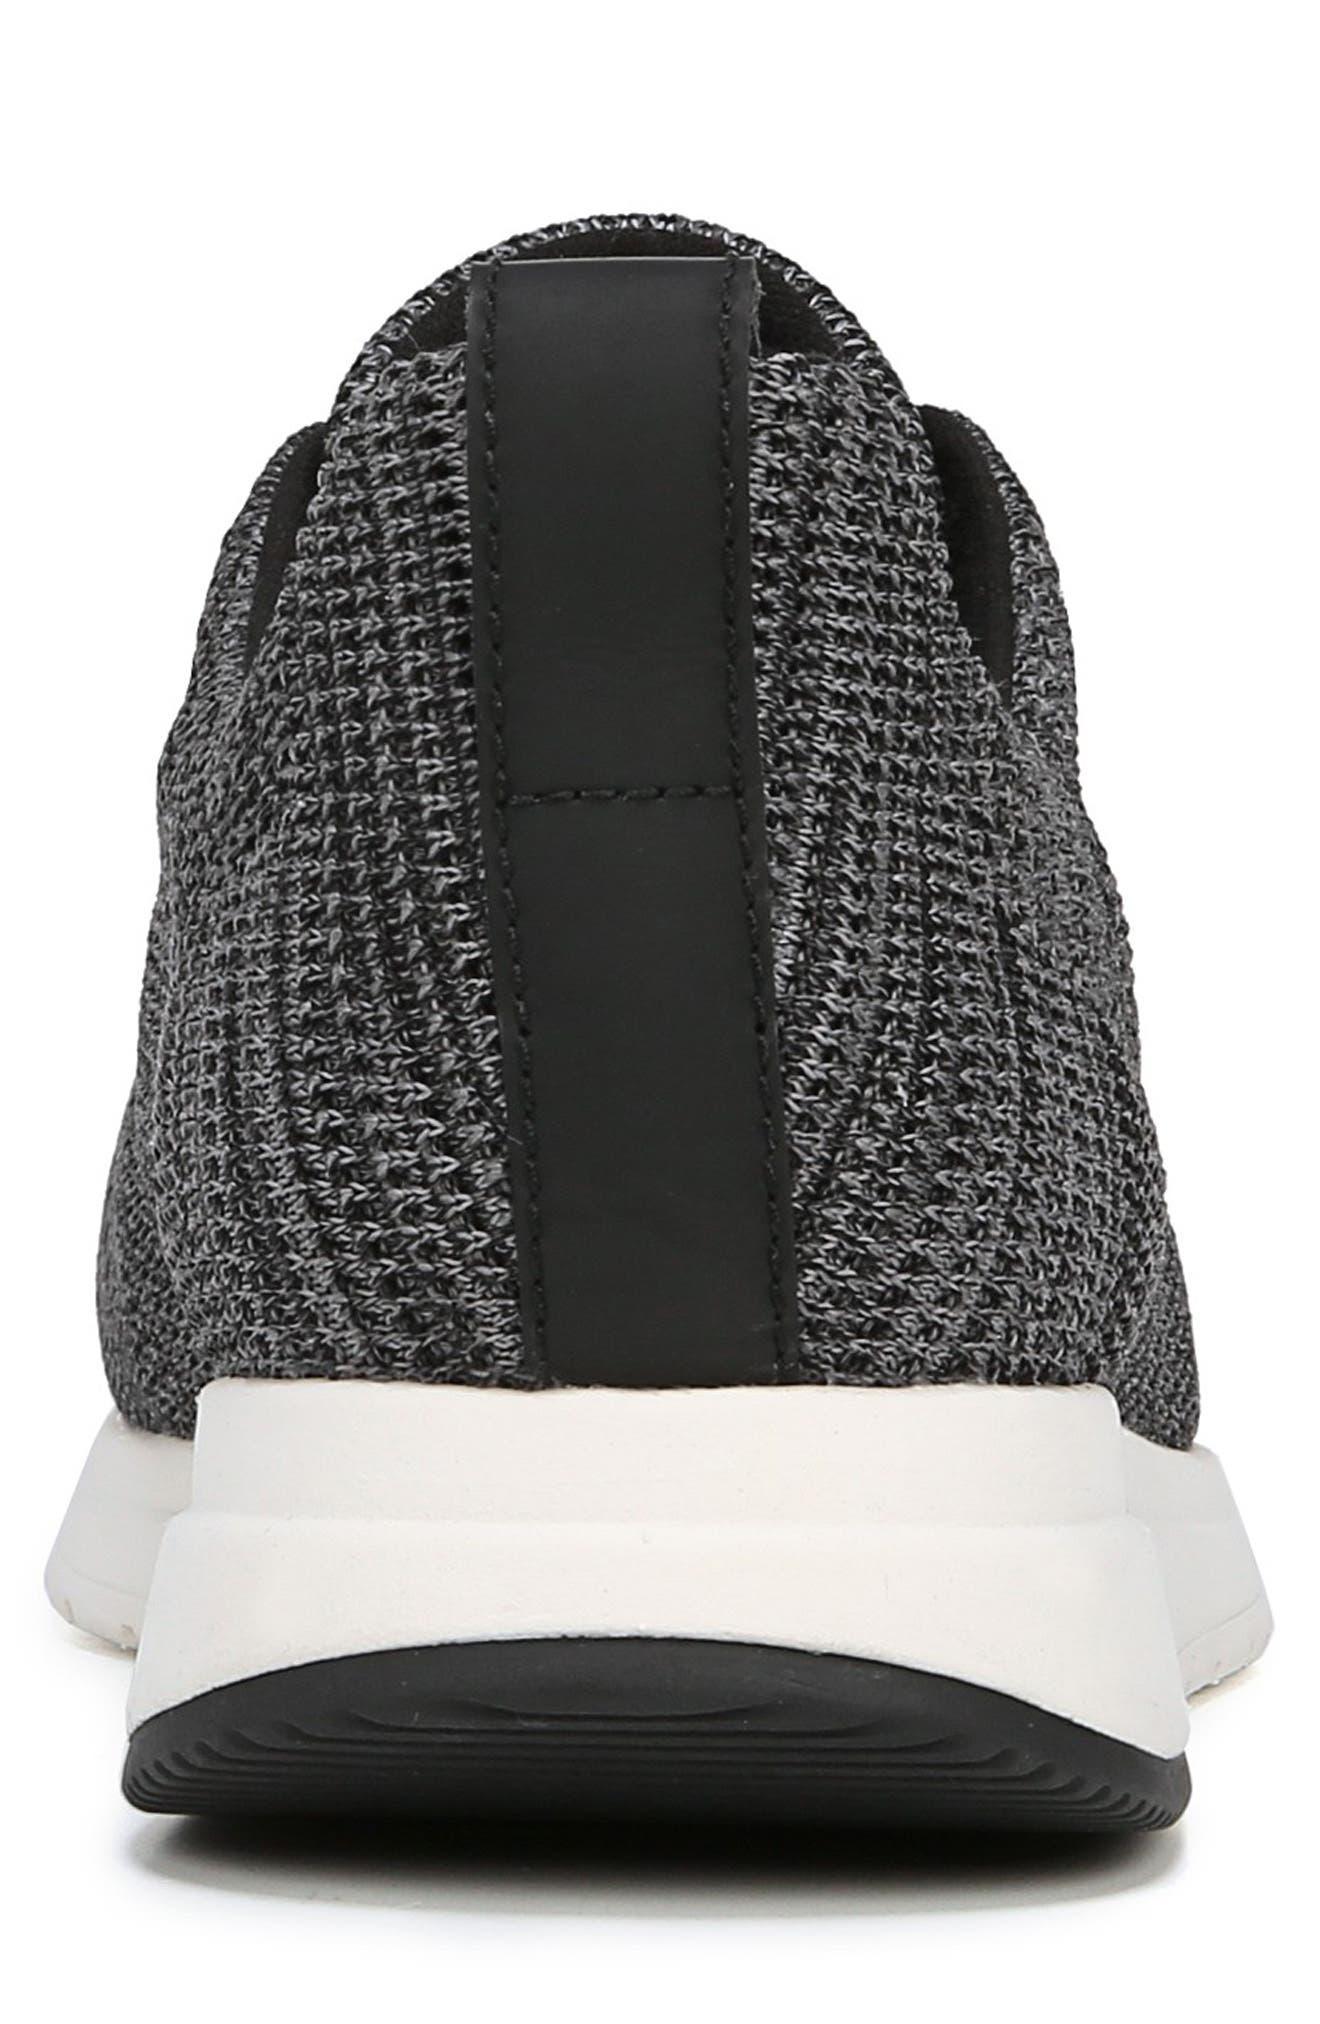 Palo Knit Sneaker,                             Alternate thumbnail 7, color,                             MARL GREY/ BLACK